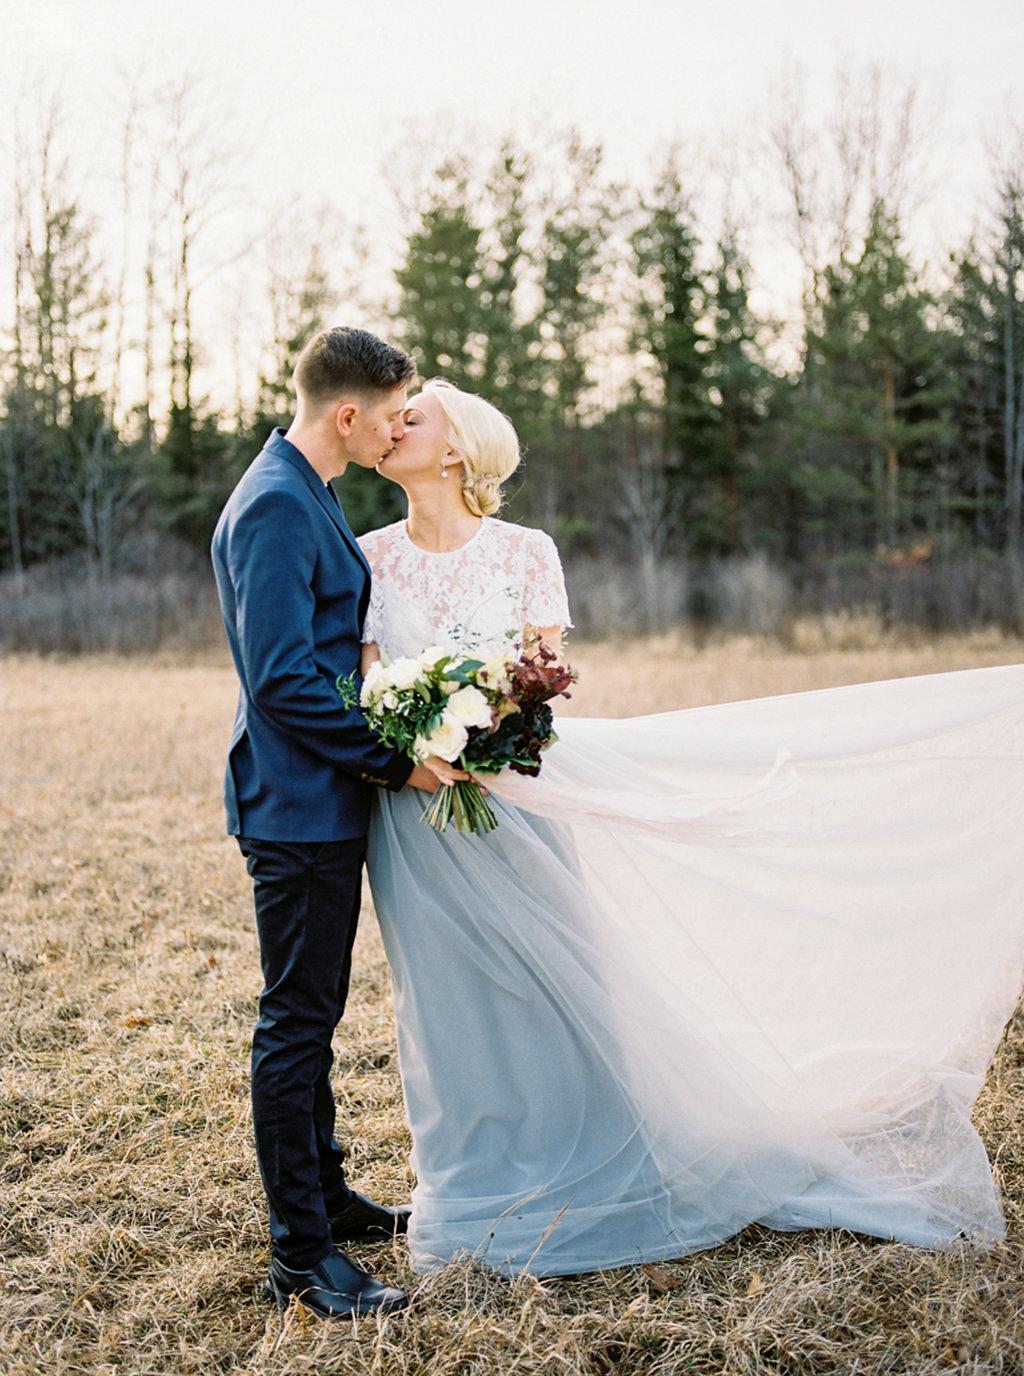 kayla-yestal-photography-vineyard-bride-swish-list-beamer-falls-manor-grimsby-engagement-22.jpg